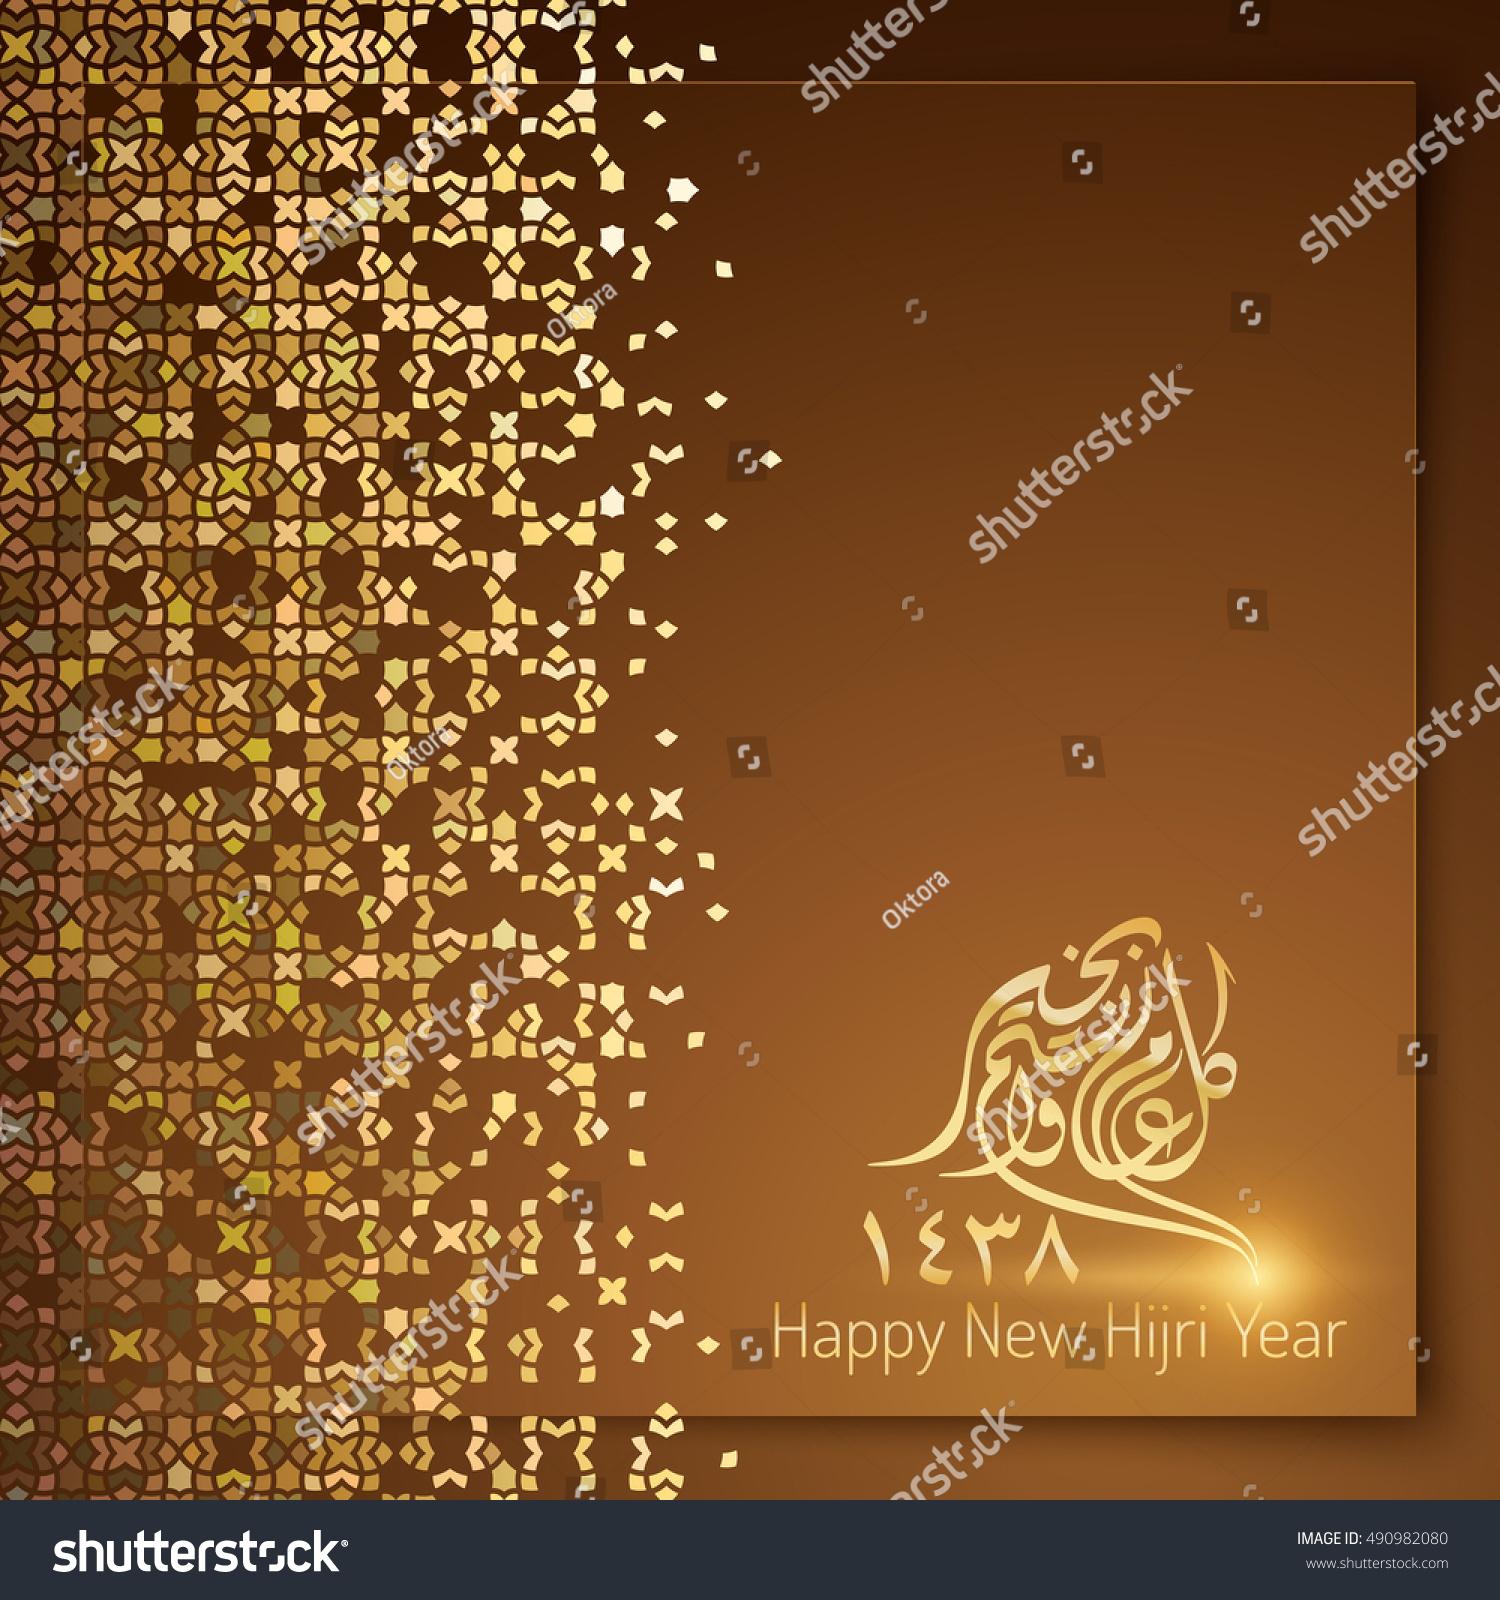 Islamic new hijri year 1438 greeting stock vector 490982080 islamic new hijri year 1438 greeting card template with morocco gold pattern kristyandbryce Images